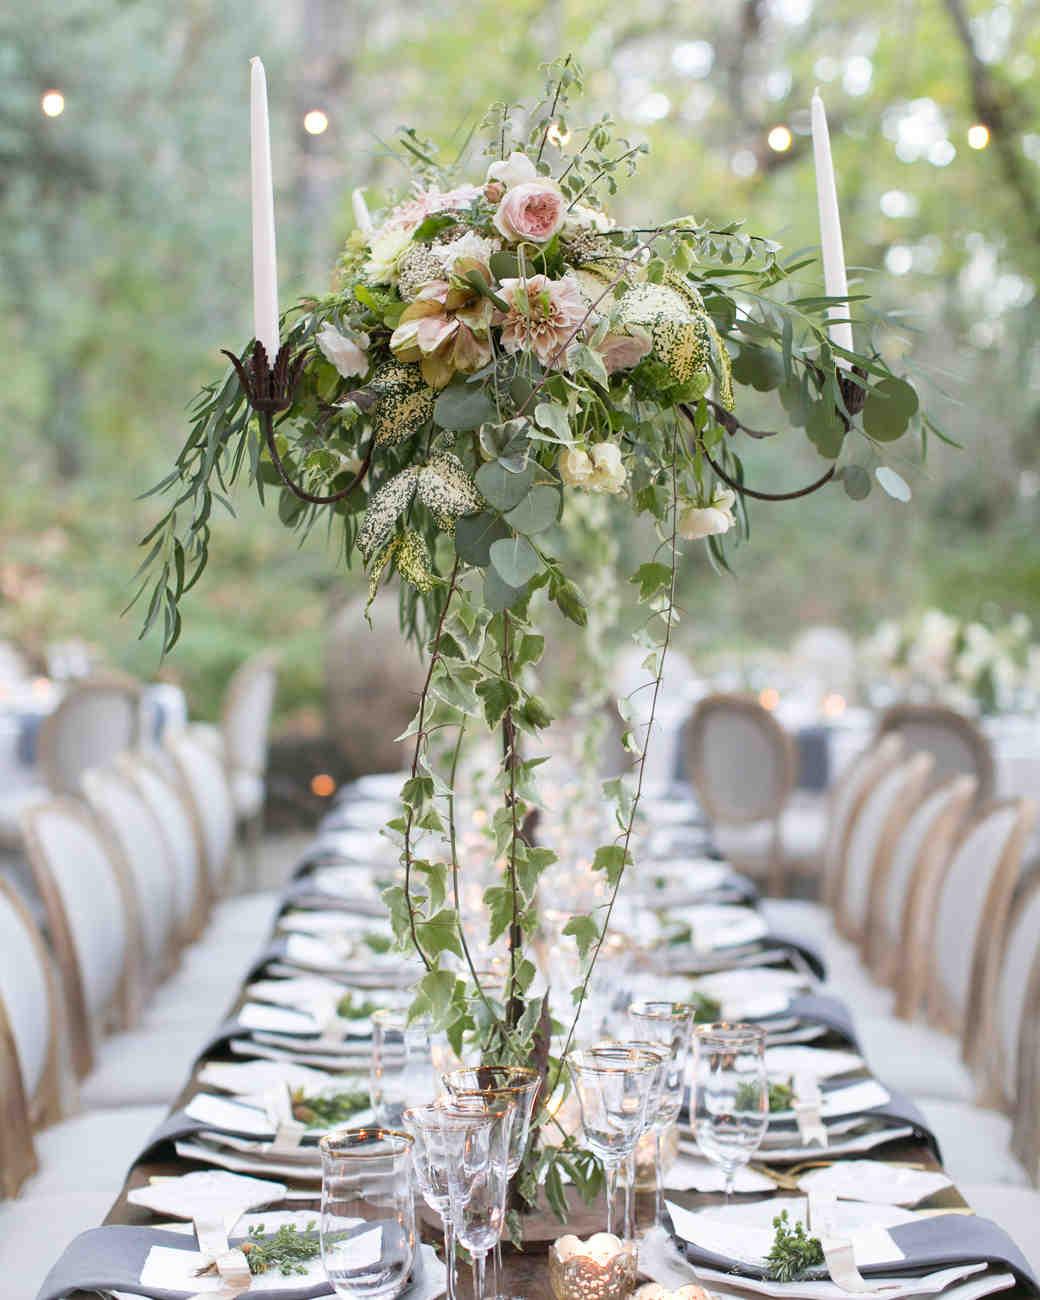 50 wedding centerpiece ideas we love martha stewart weddings rh marthastewartweddings com wedding table centerpieces ideas flowers wedding table centerpieces without flowers